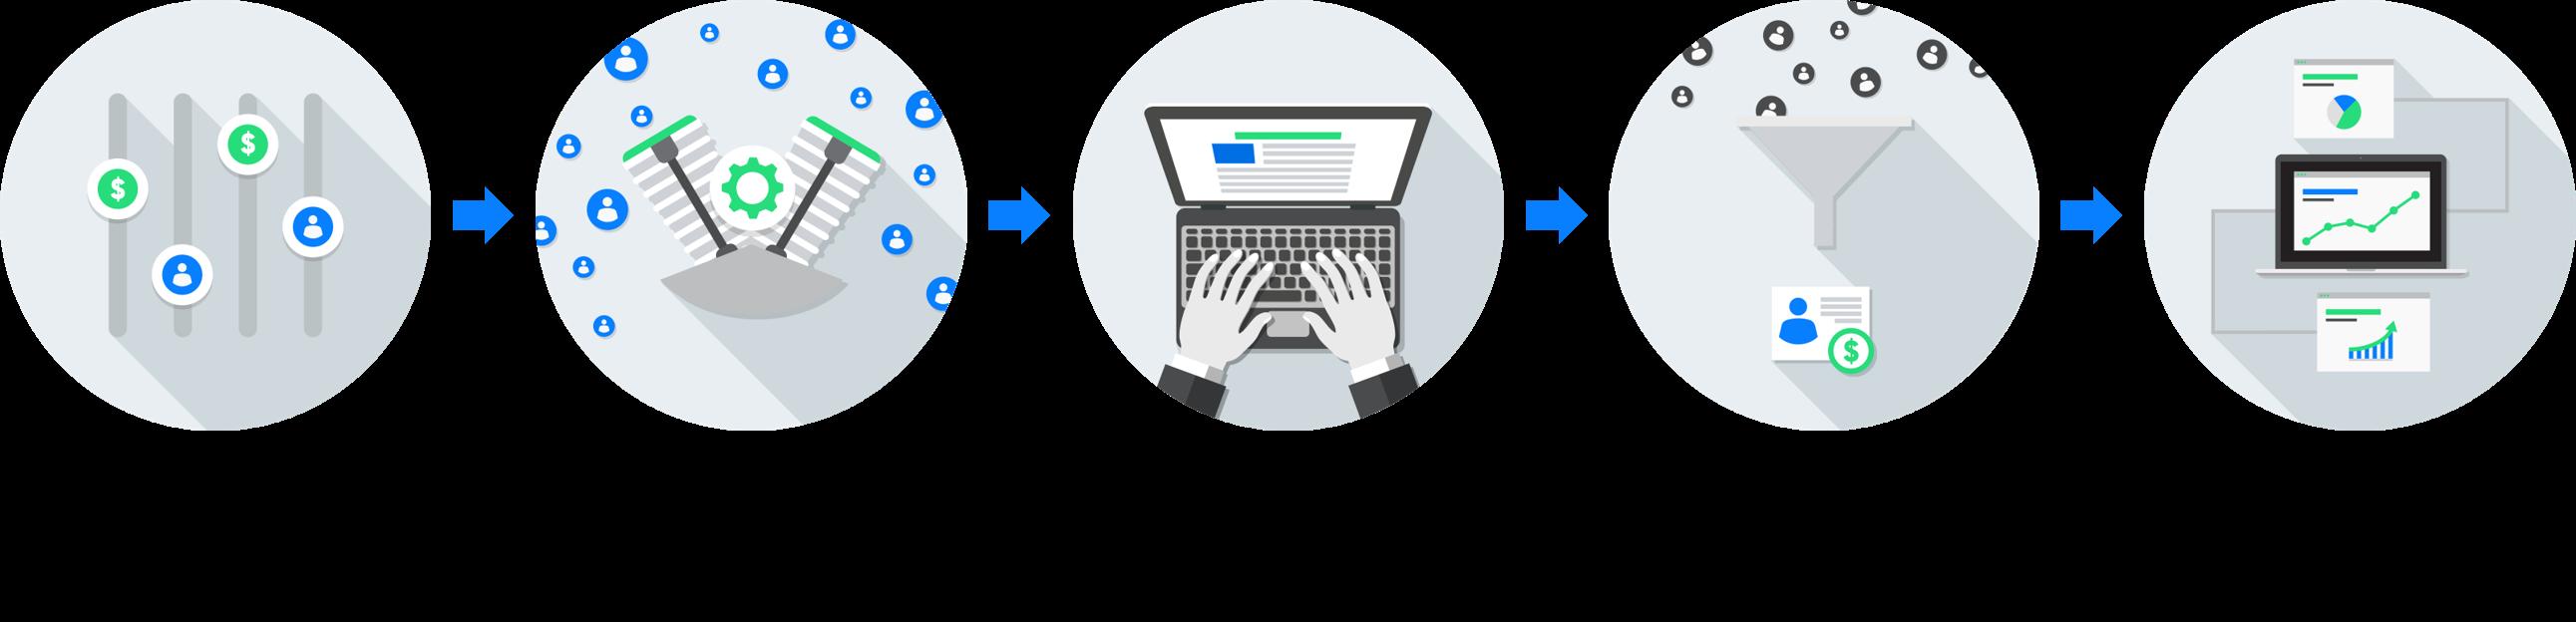 How it Works - Appcast Exchange